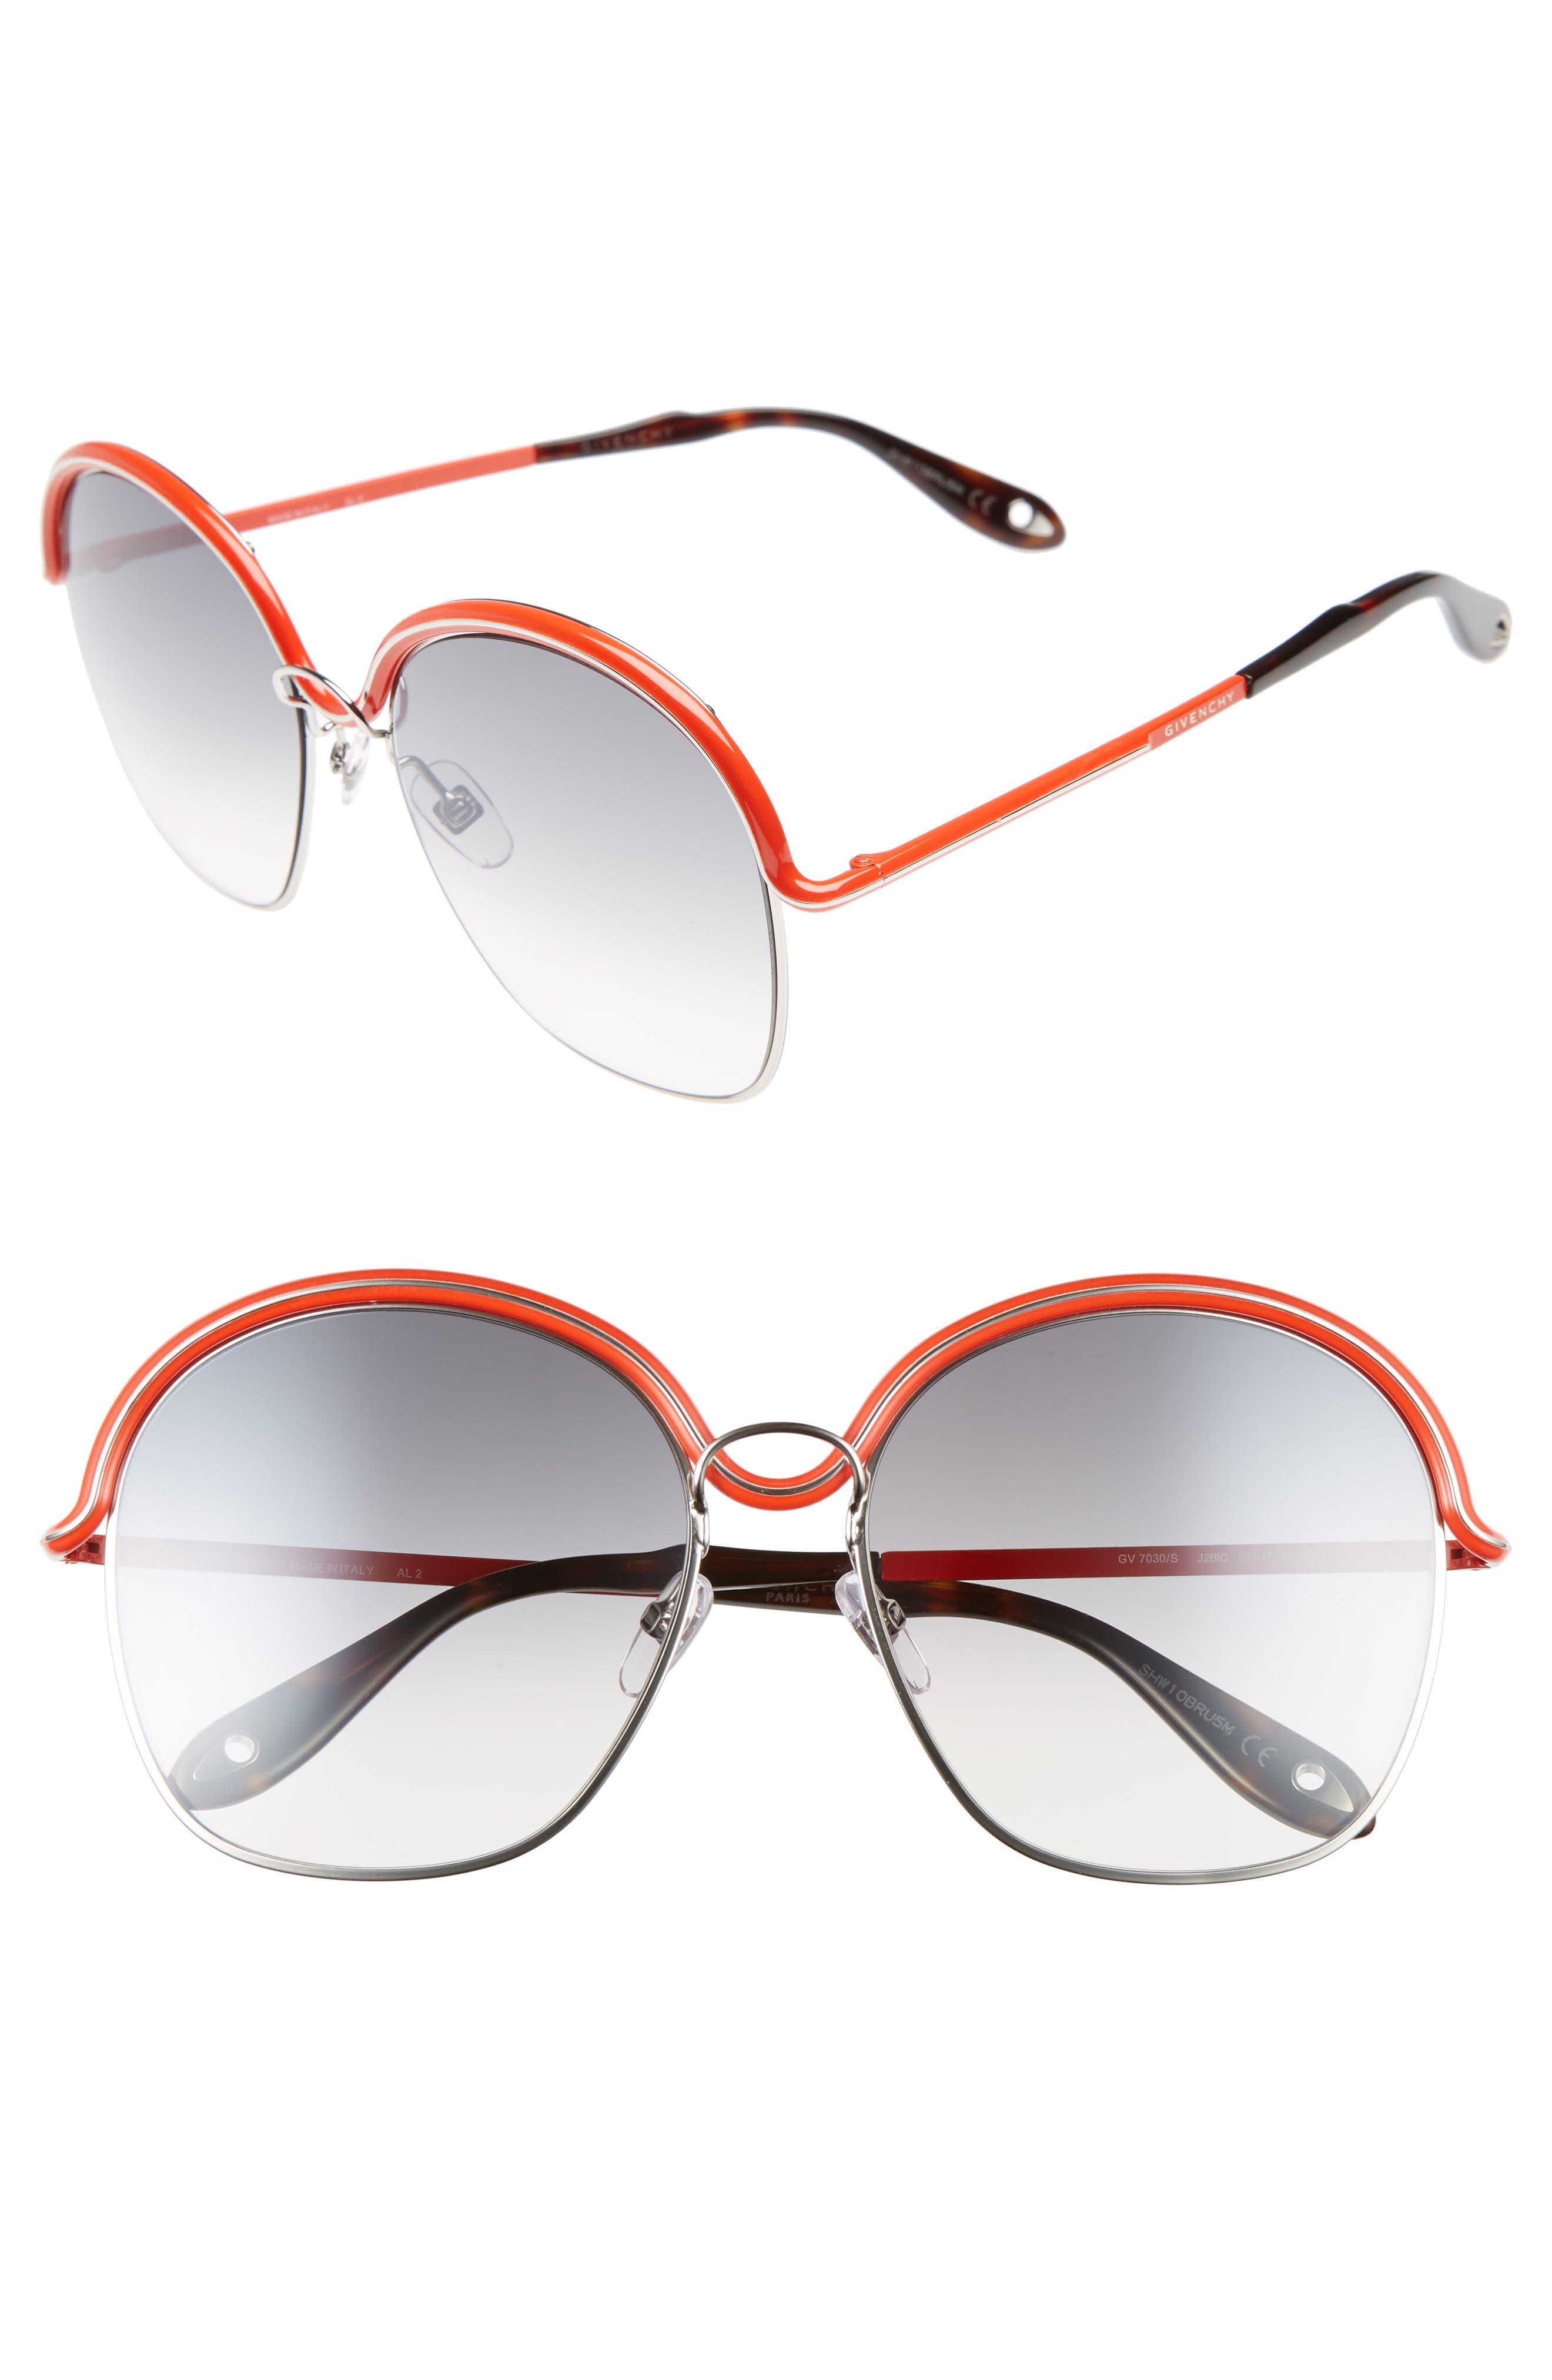 7030/S 58mm Oversized Sunglasses,                             Main thumbnail 1, color,                             040